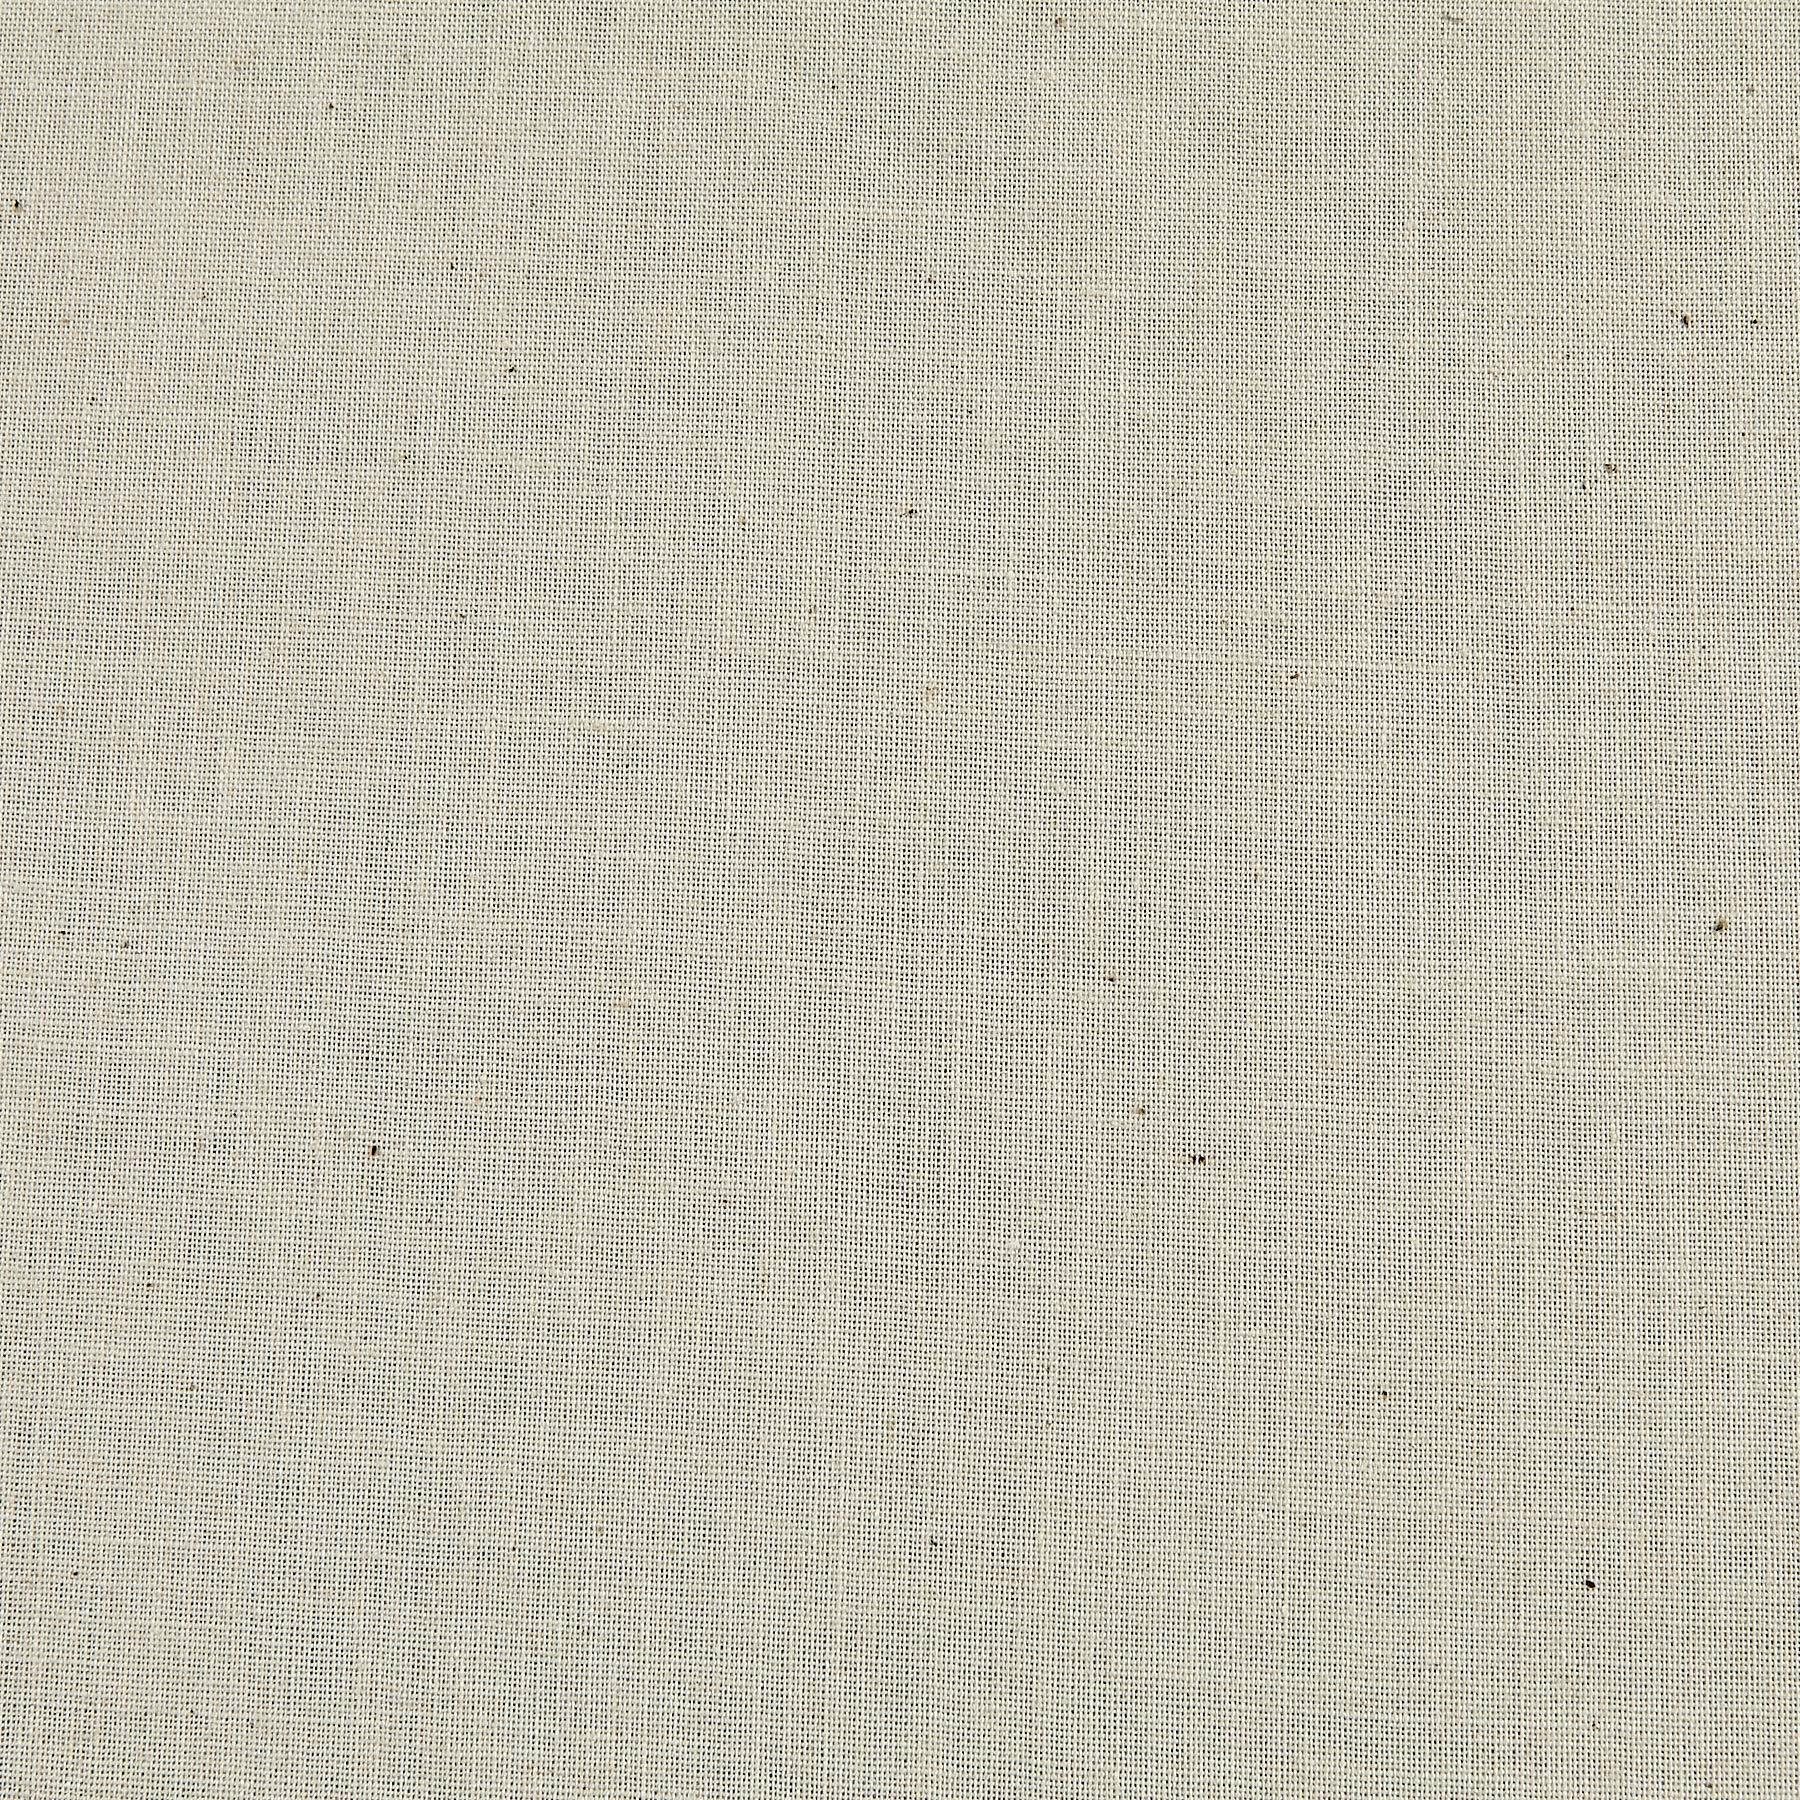 James Thompson Meadowlark Premium Muslin Natural Fabric By The Yard